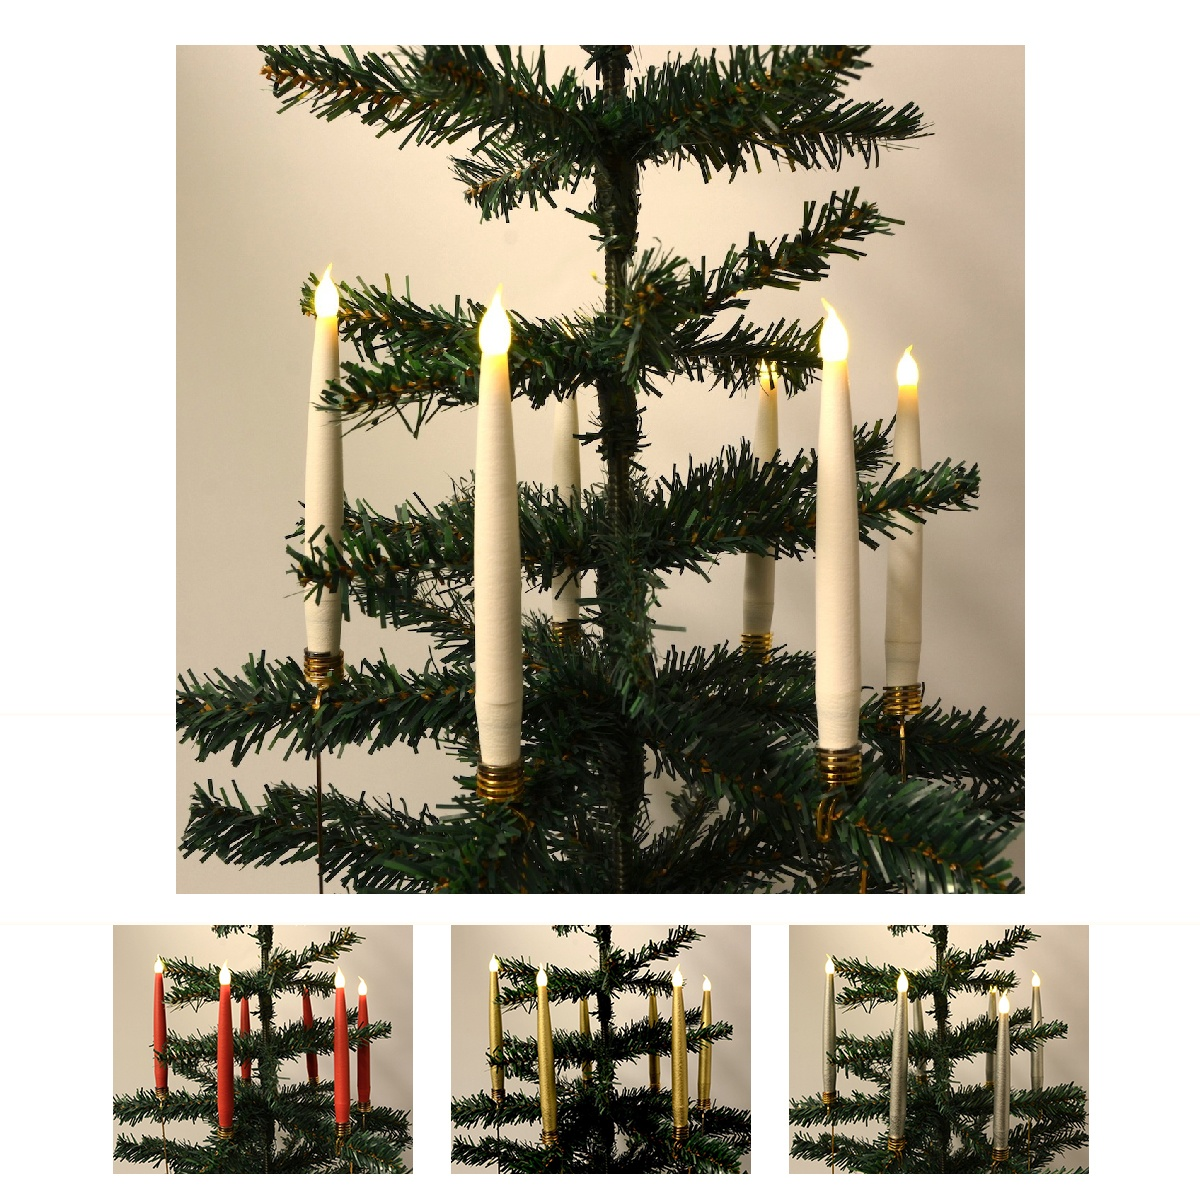 Juletræslys LED 10 stk. Trådløse inkl. Fjernbetjening & Klemmer - passer til de fleste Georg Jensen lysholdere m.m.